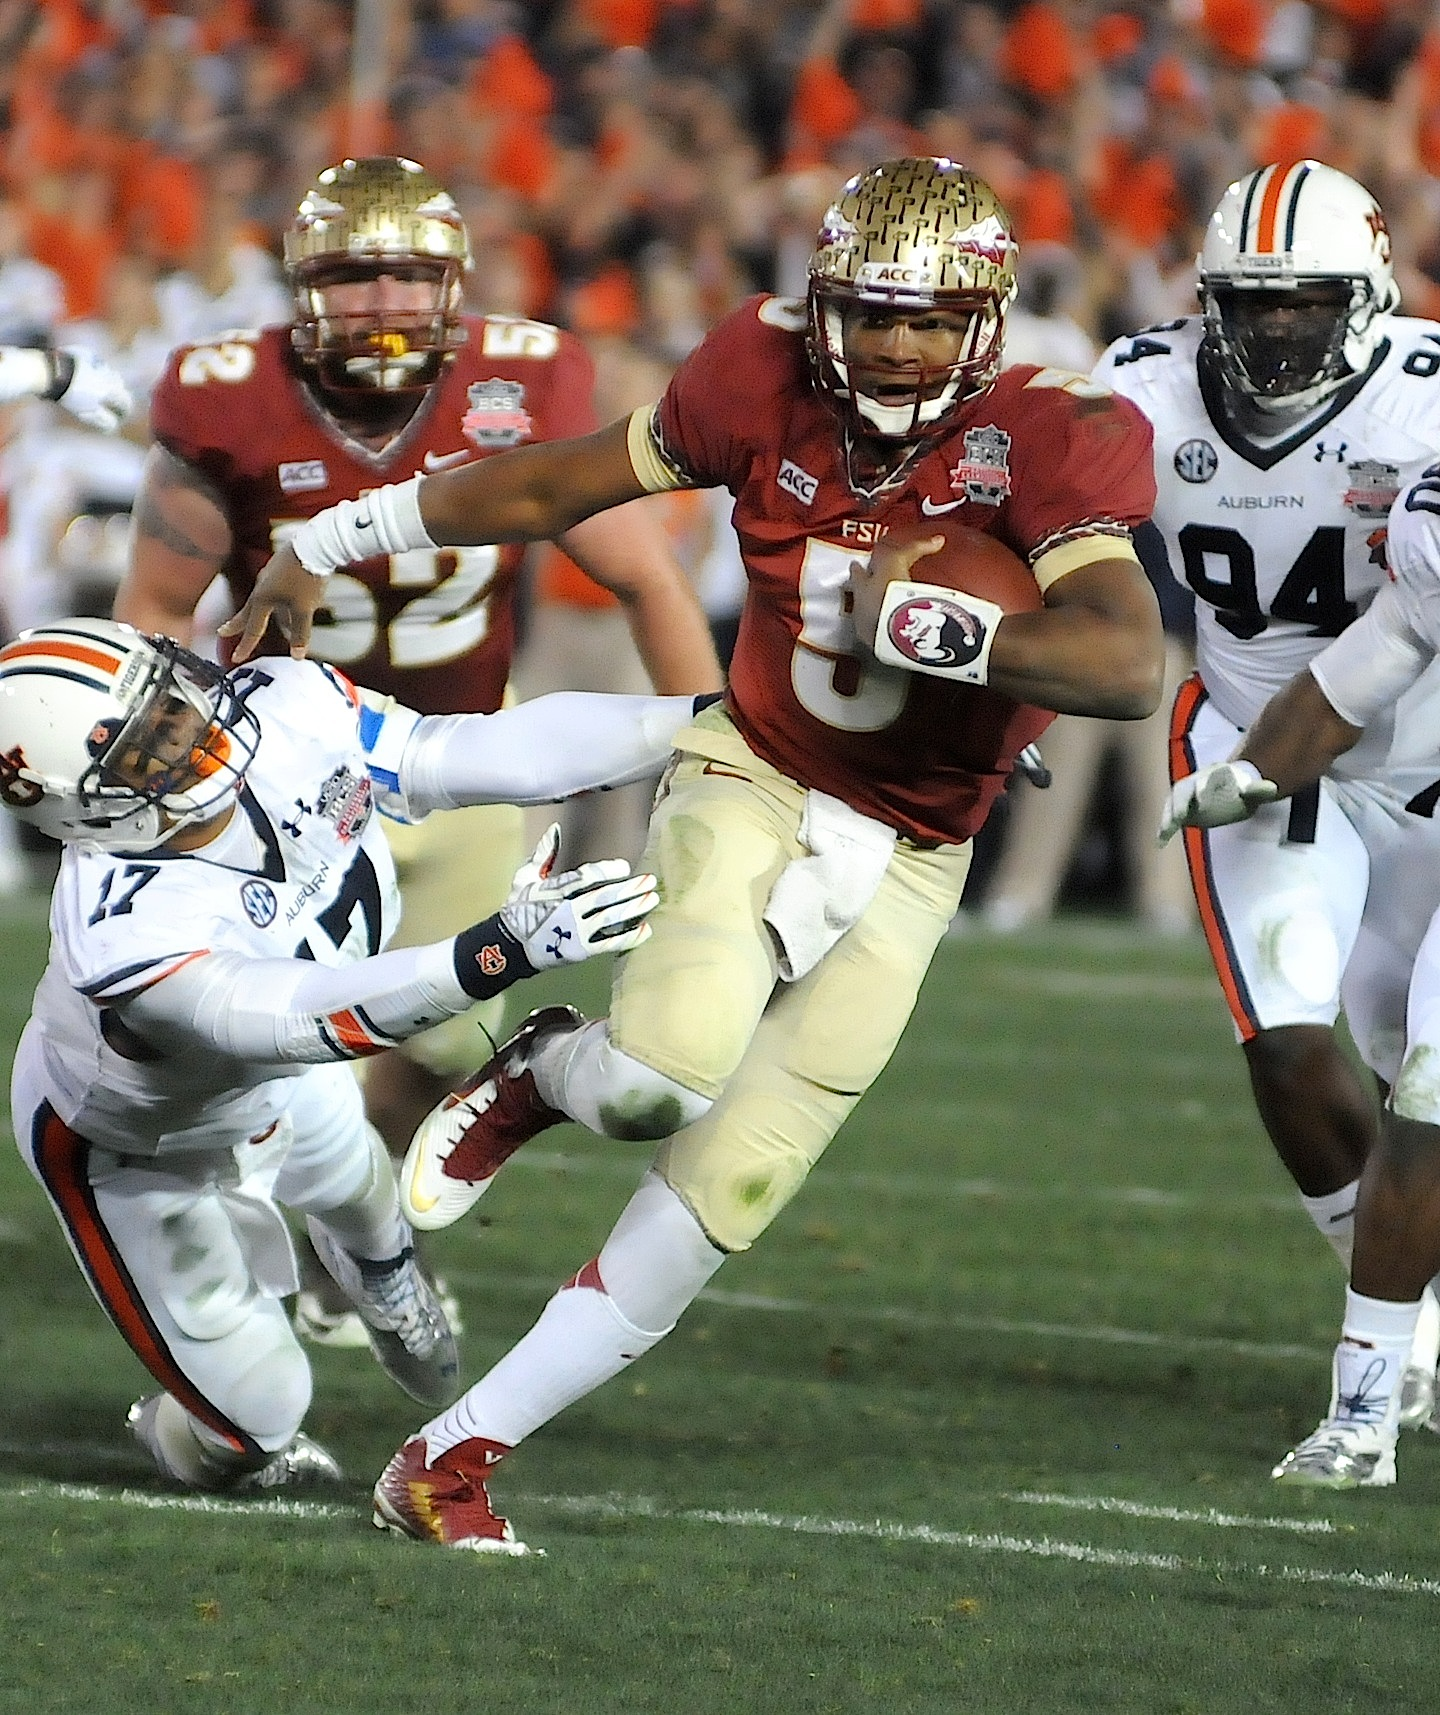 Florida State University Football quarterback